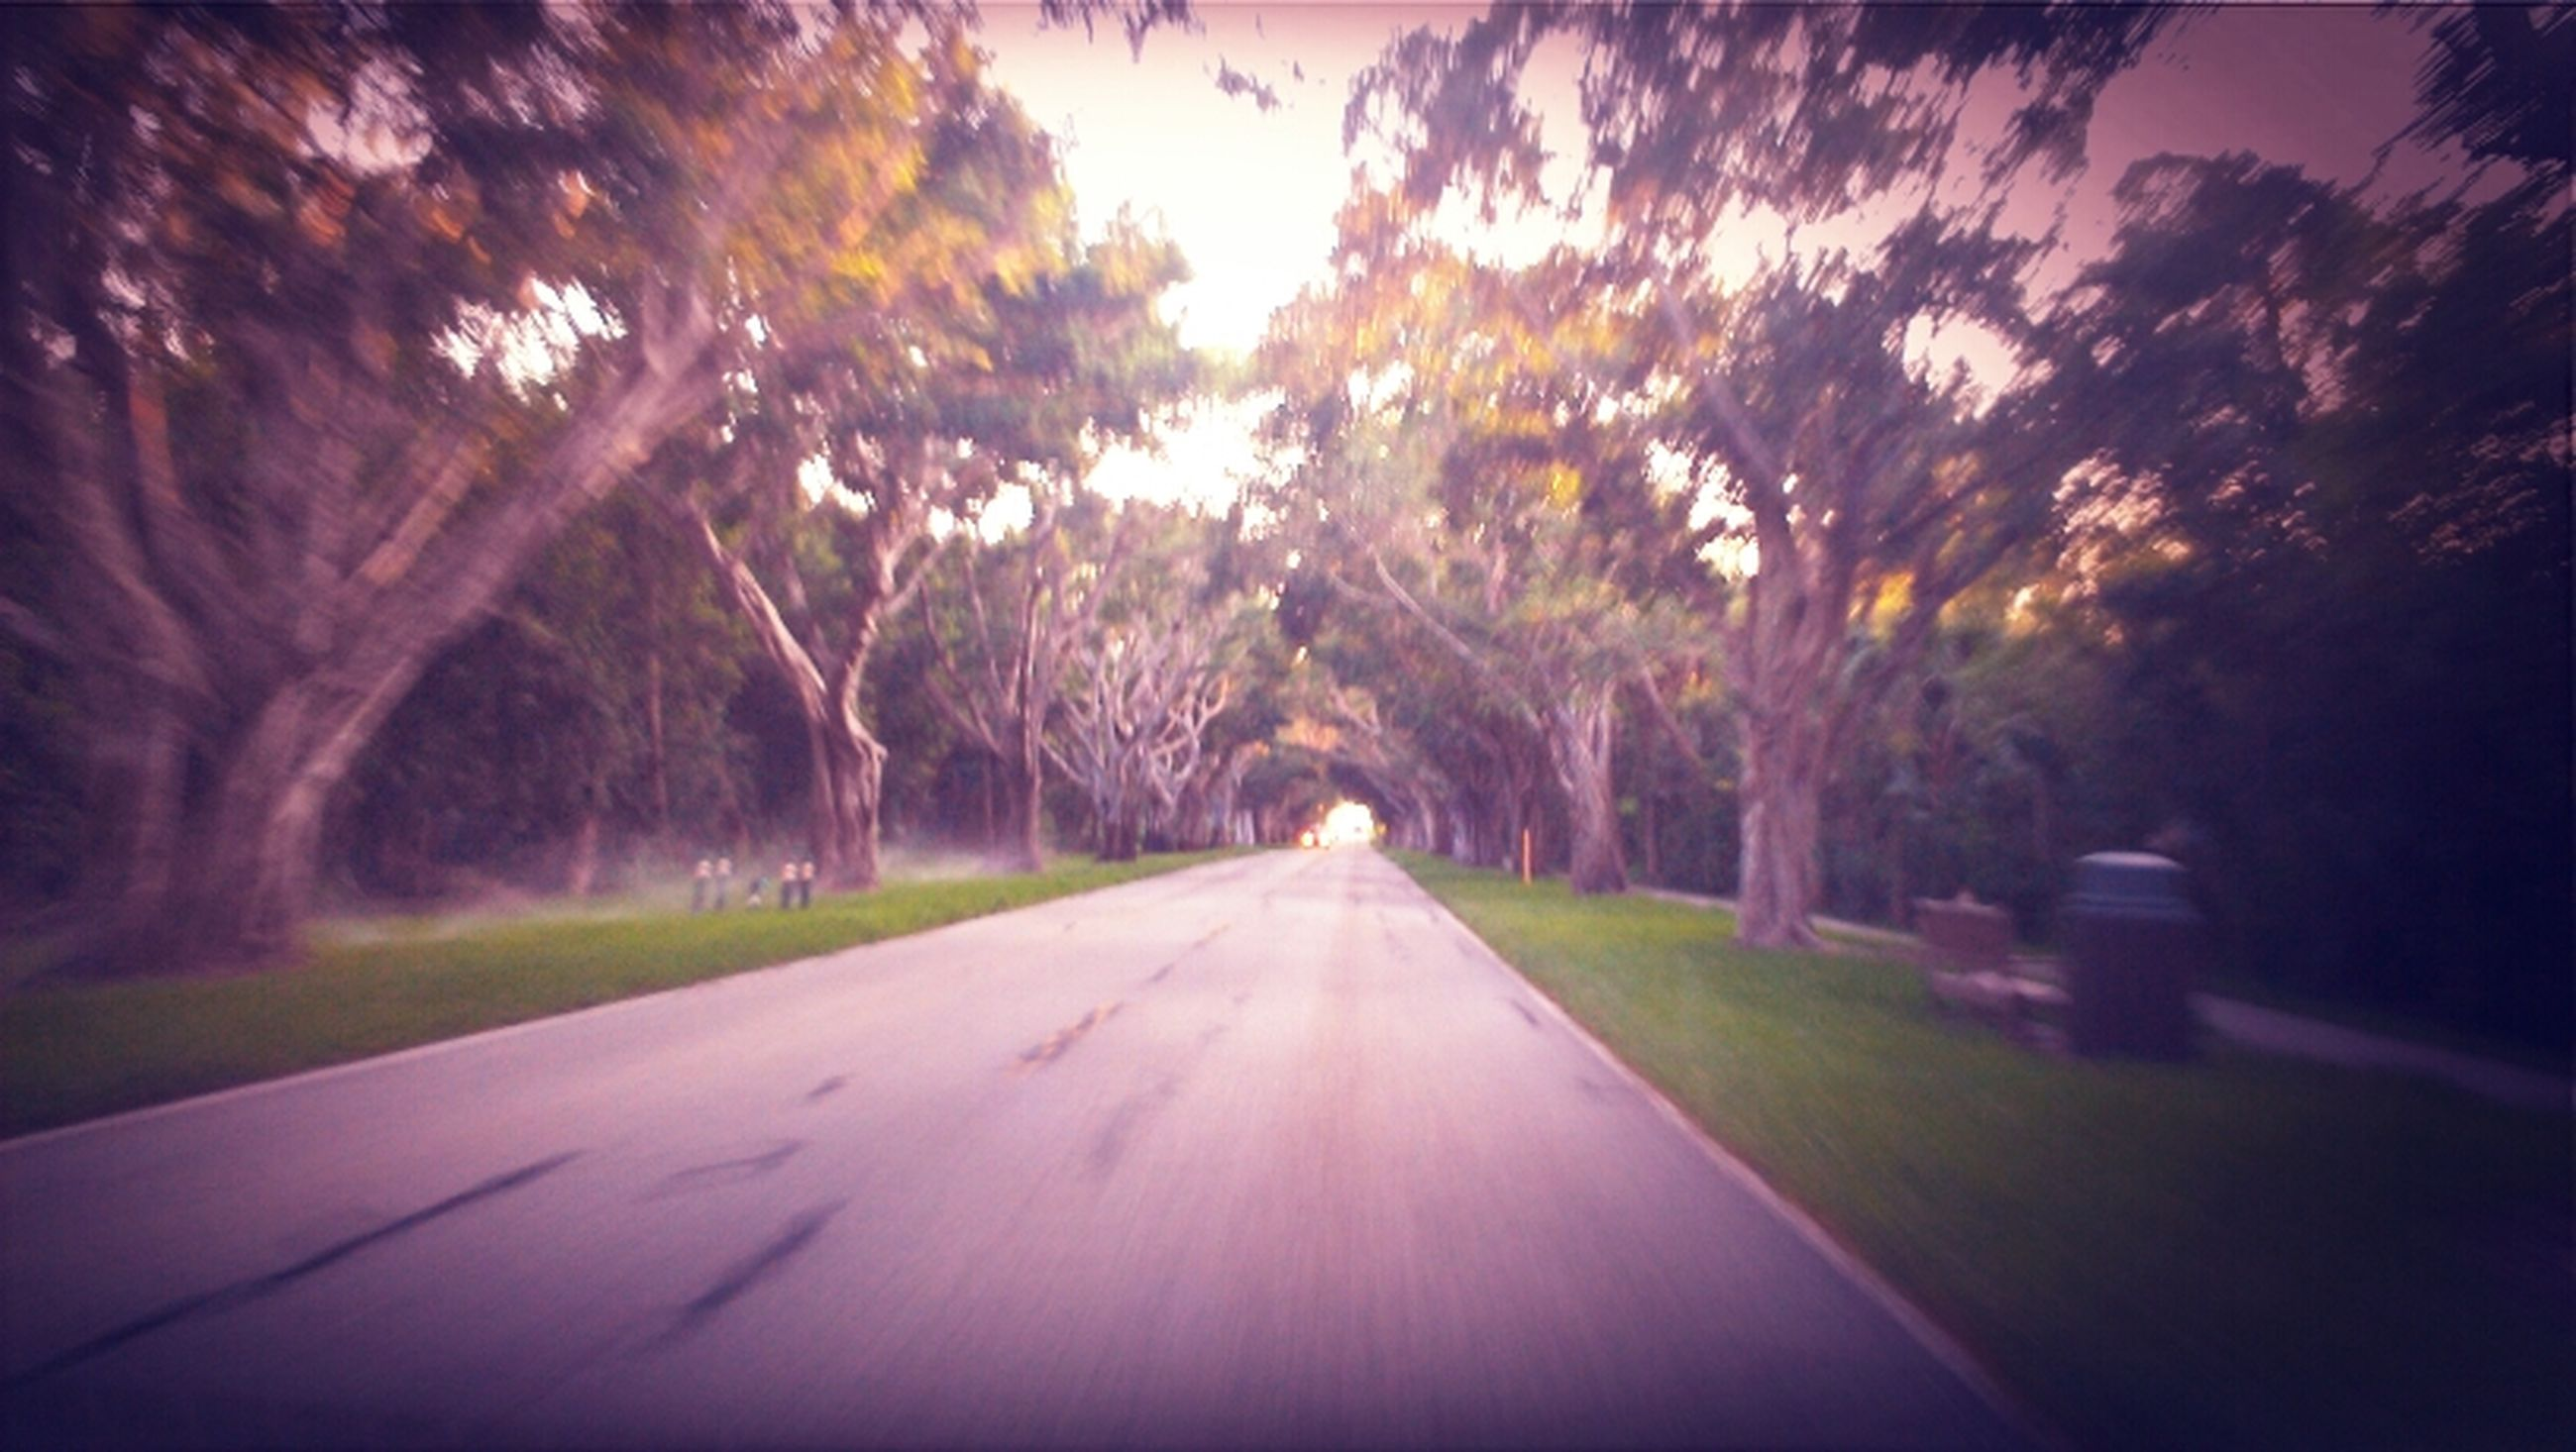 the way forward, tree, diminishing perspective, road, sky, vanishing point, transportation, illuminated, nature, dusk, outdoors, tranquility, night, growth, empty road, surface level, no people, empty, street, tranquil scene